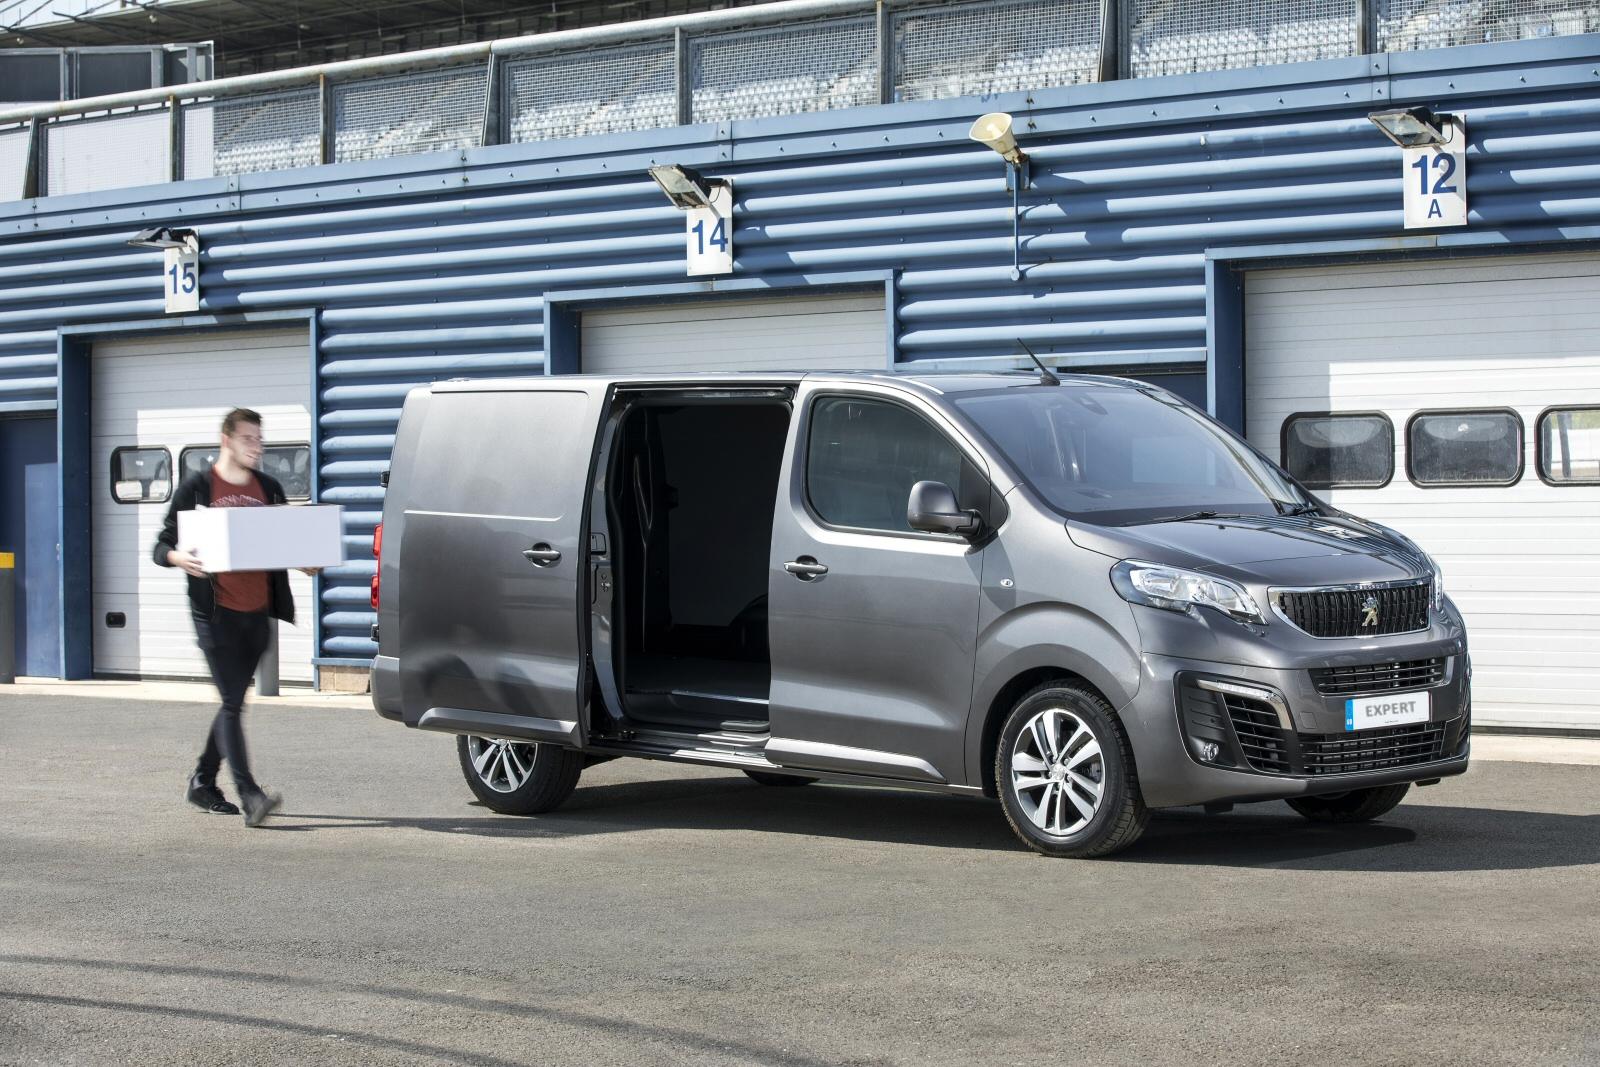 2663c0dc07 New Peugeot Expert Standard Diesel 1000 1.6 BlueHDi 95 Professional ...